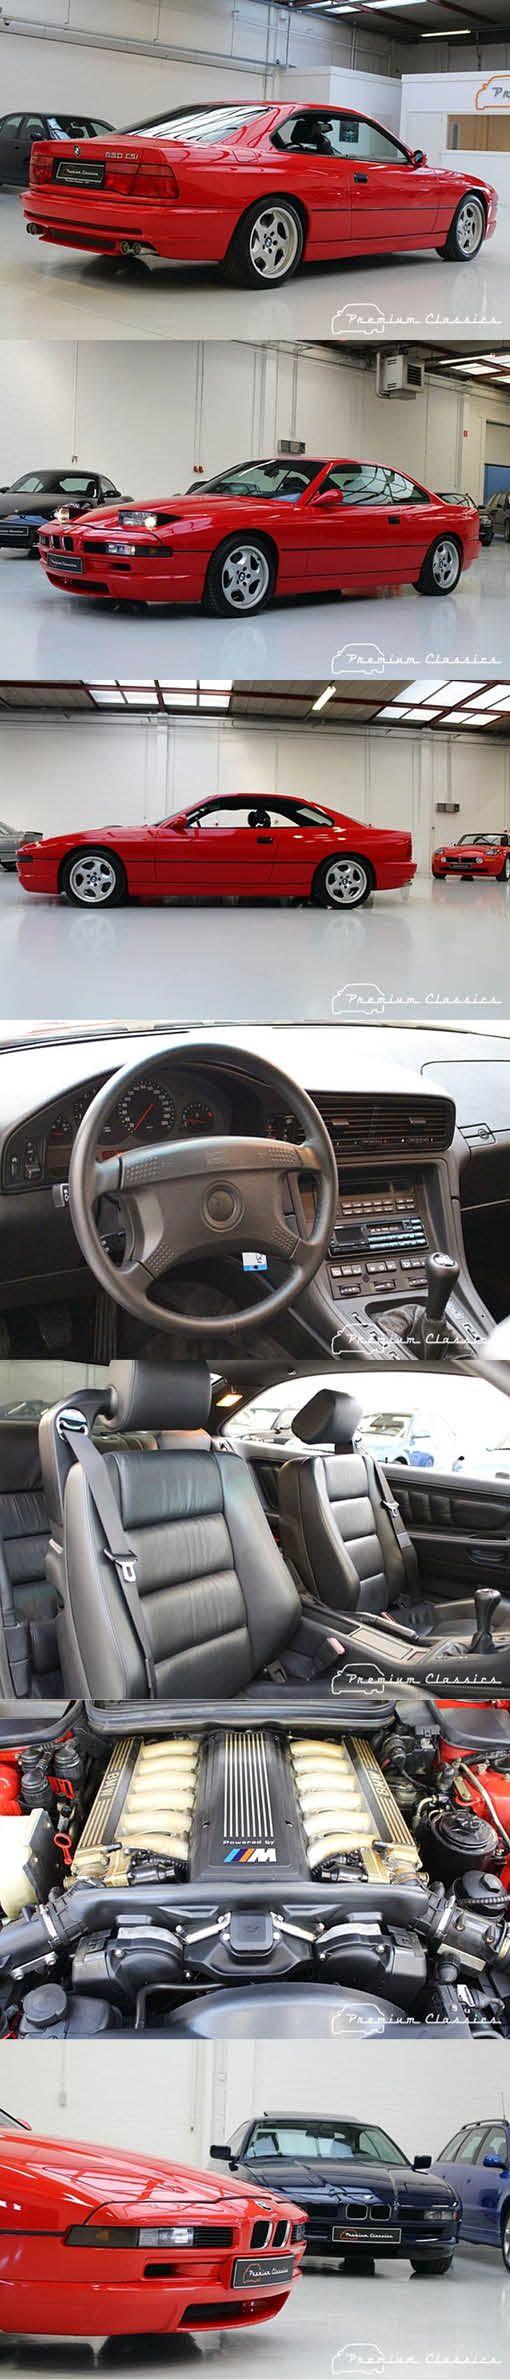 1995 BMW 850 CSi / Germany / 375hp V12 / red / hypercarbulli